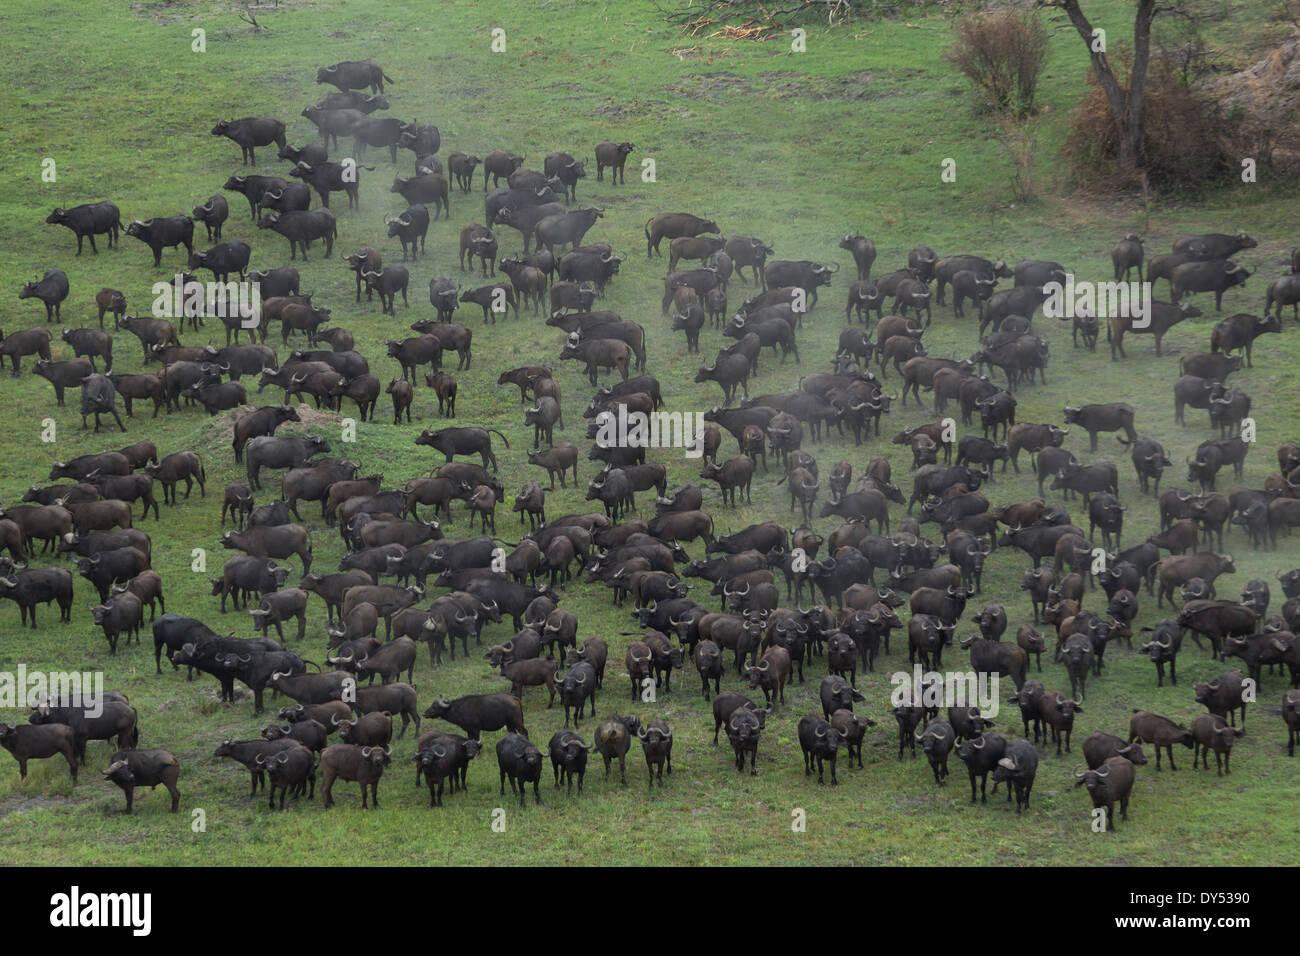 Aerial view of a herd of buffalo, Okavango Delta, Chobe National Park, Botswana, Africa - Stock Image